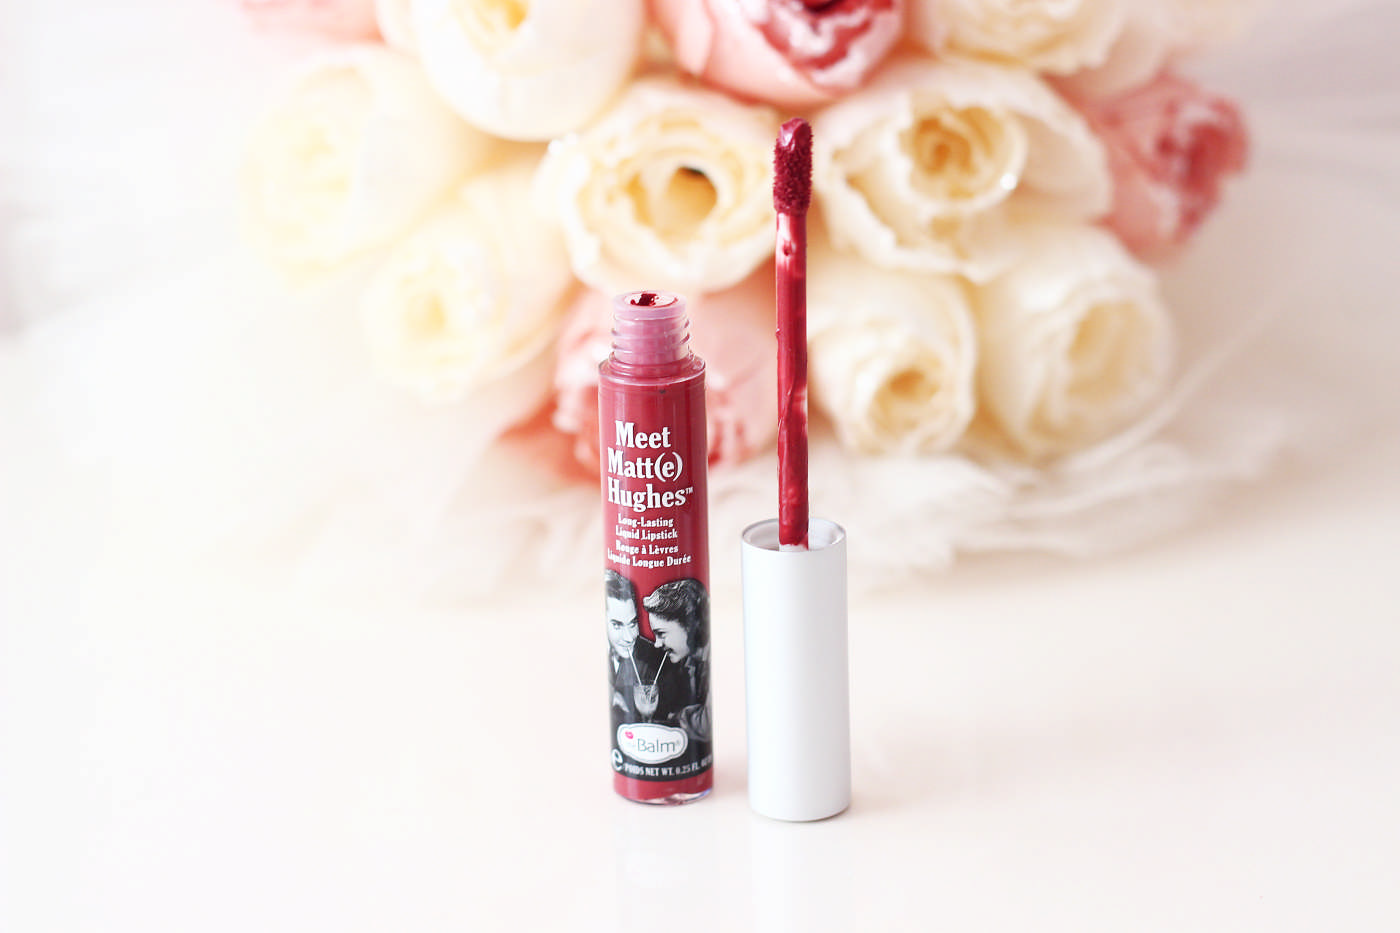 The Balm Meet Matte Hughes Liquid Lipstick Likit Ruj - Trustworthy (1)